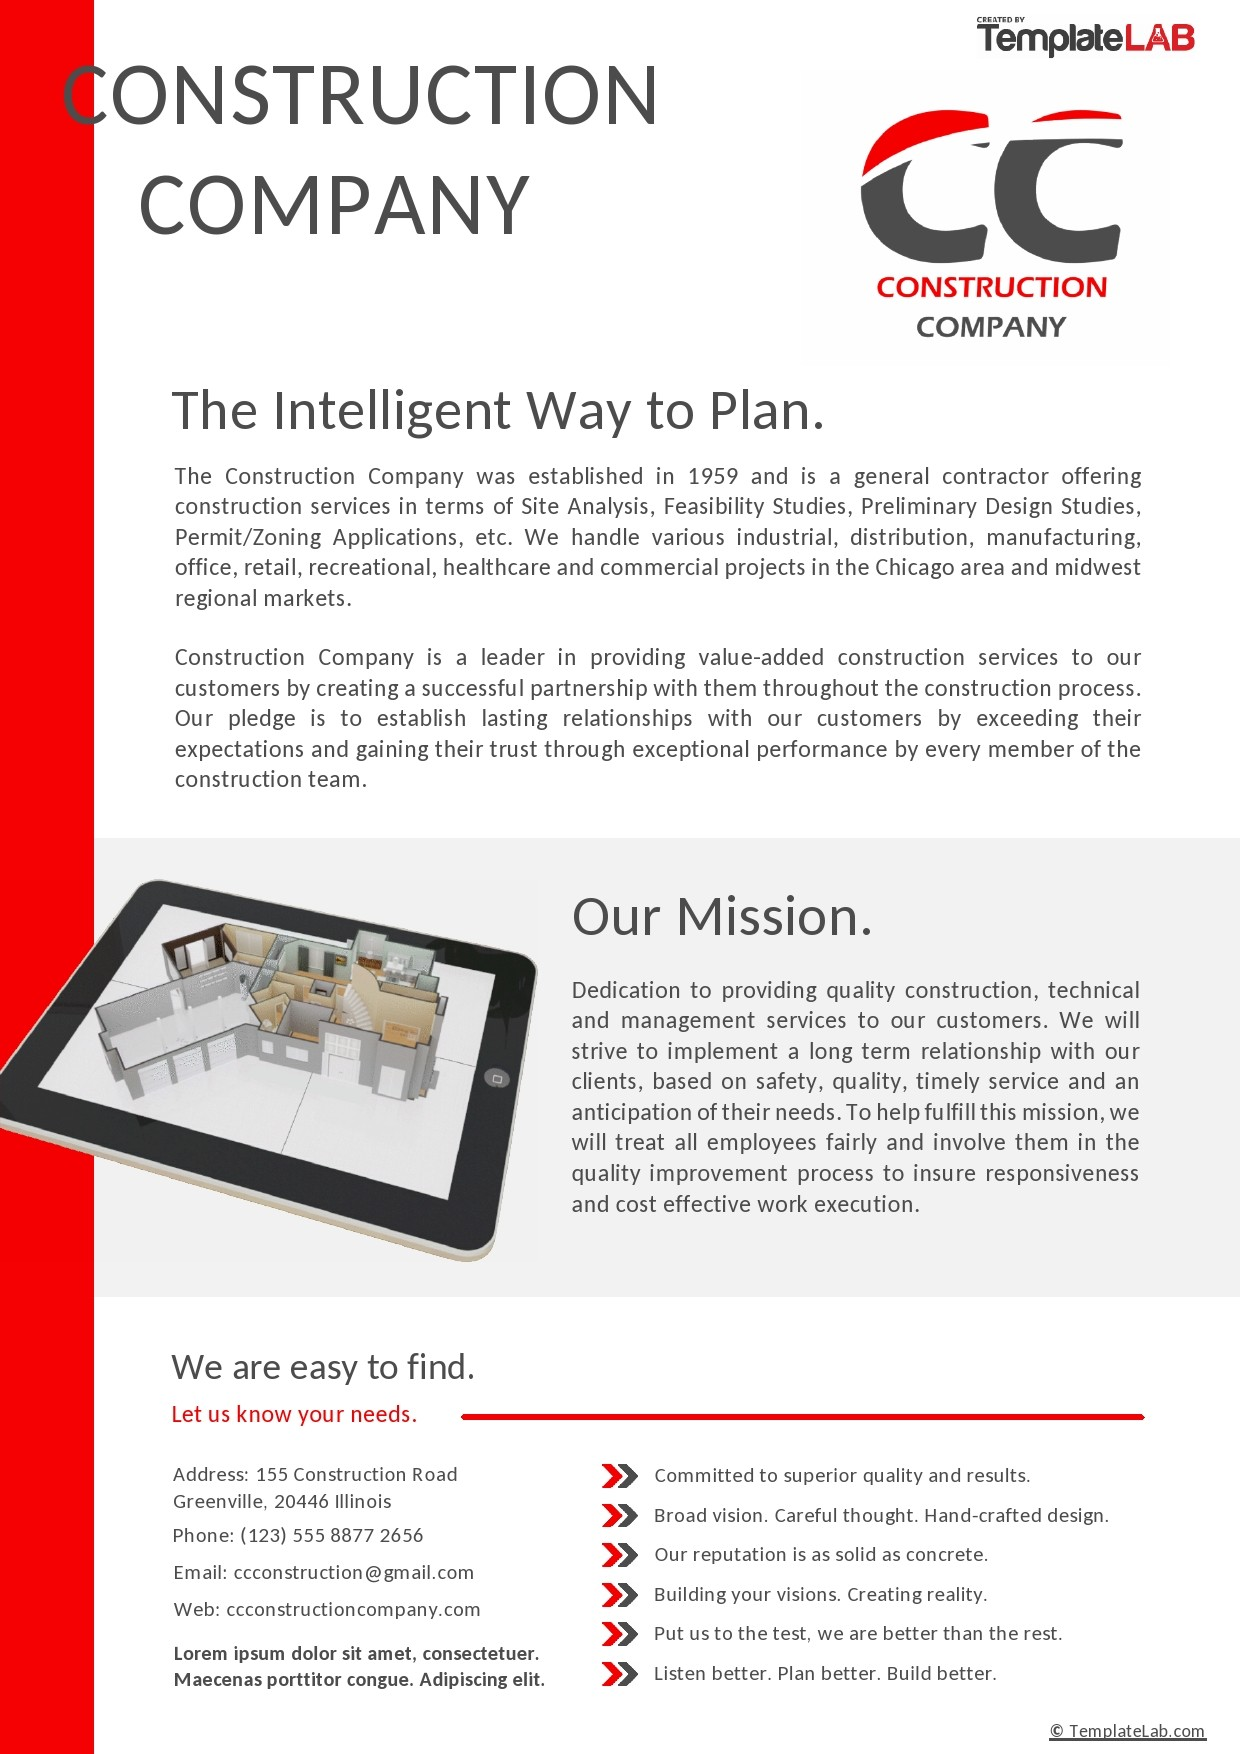 Free Construction Company Profile Template - TemplateLab.com